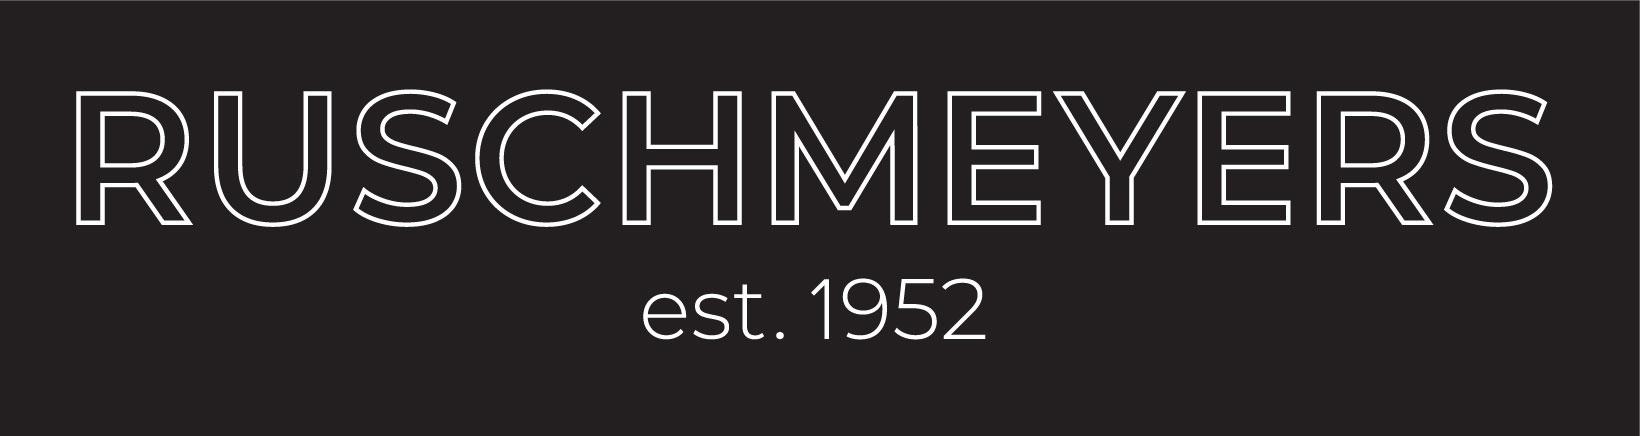 Ruschmeyer Hospitality Group Home